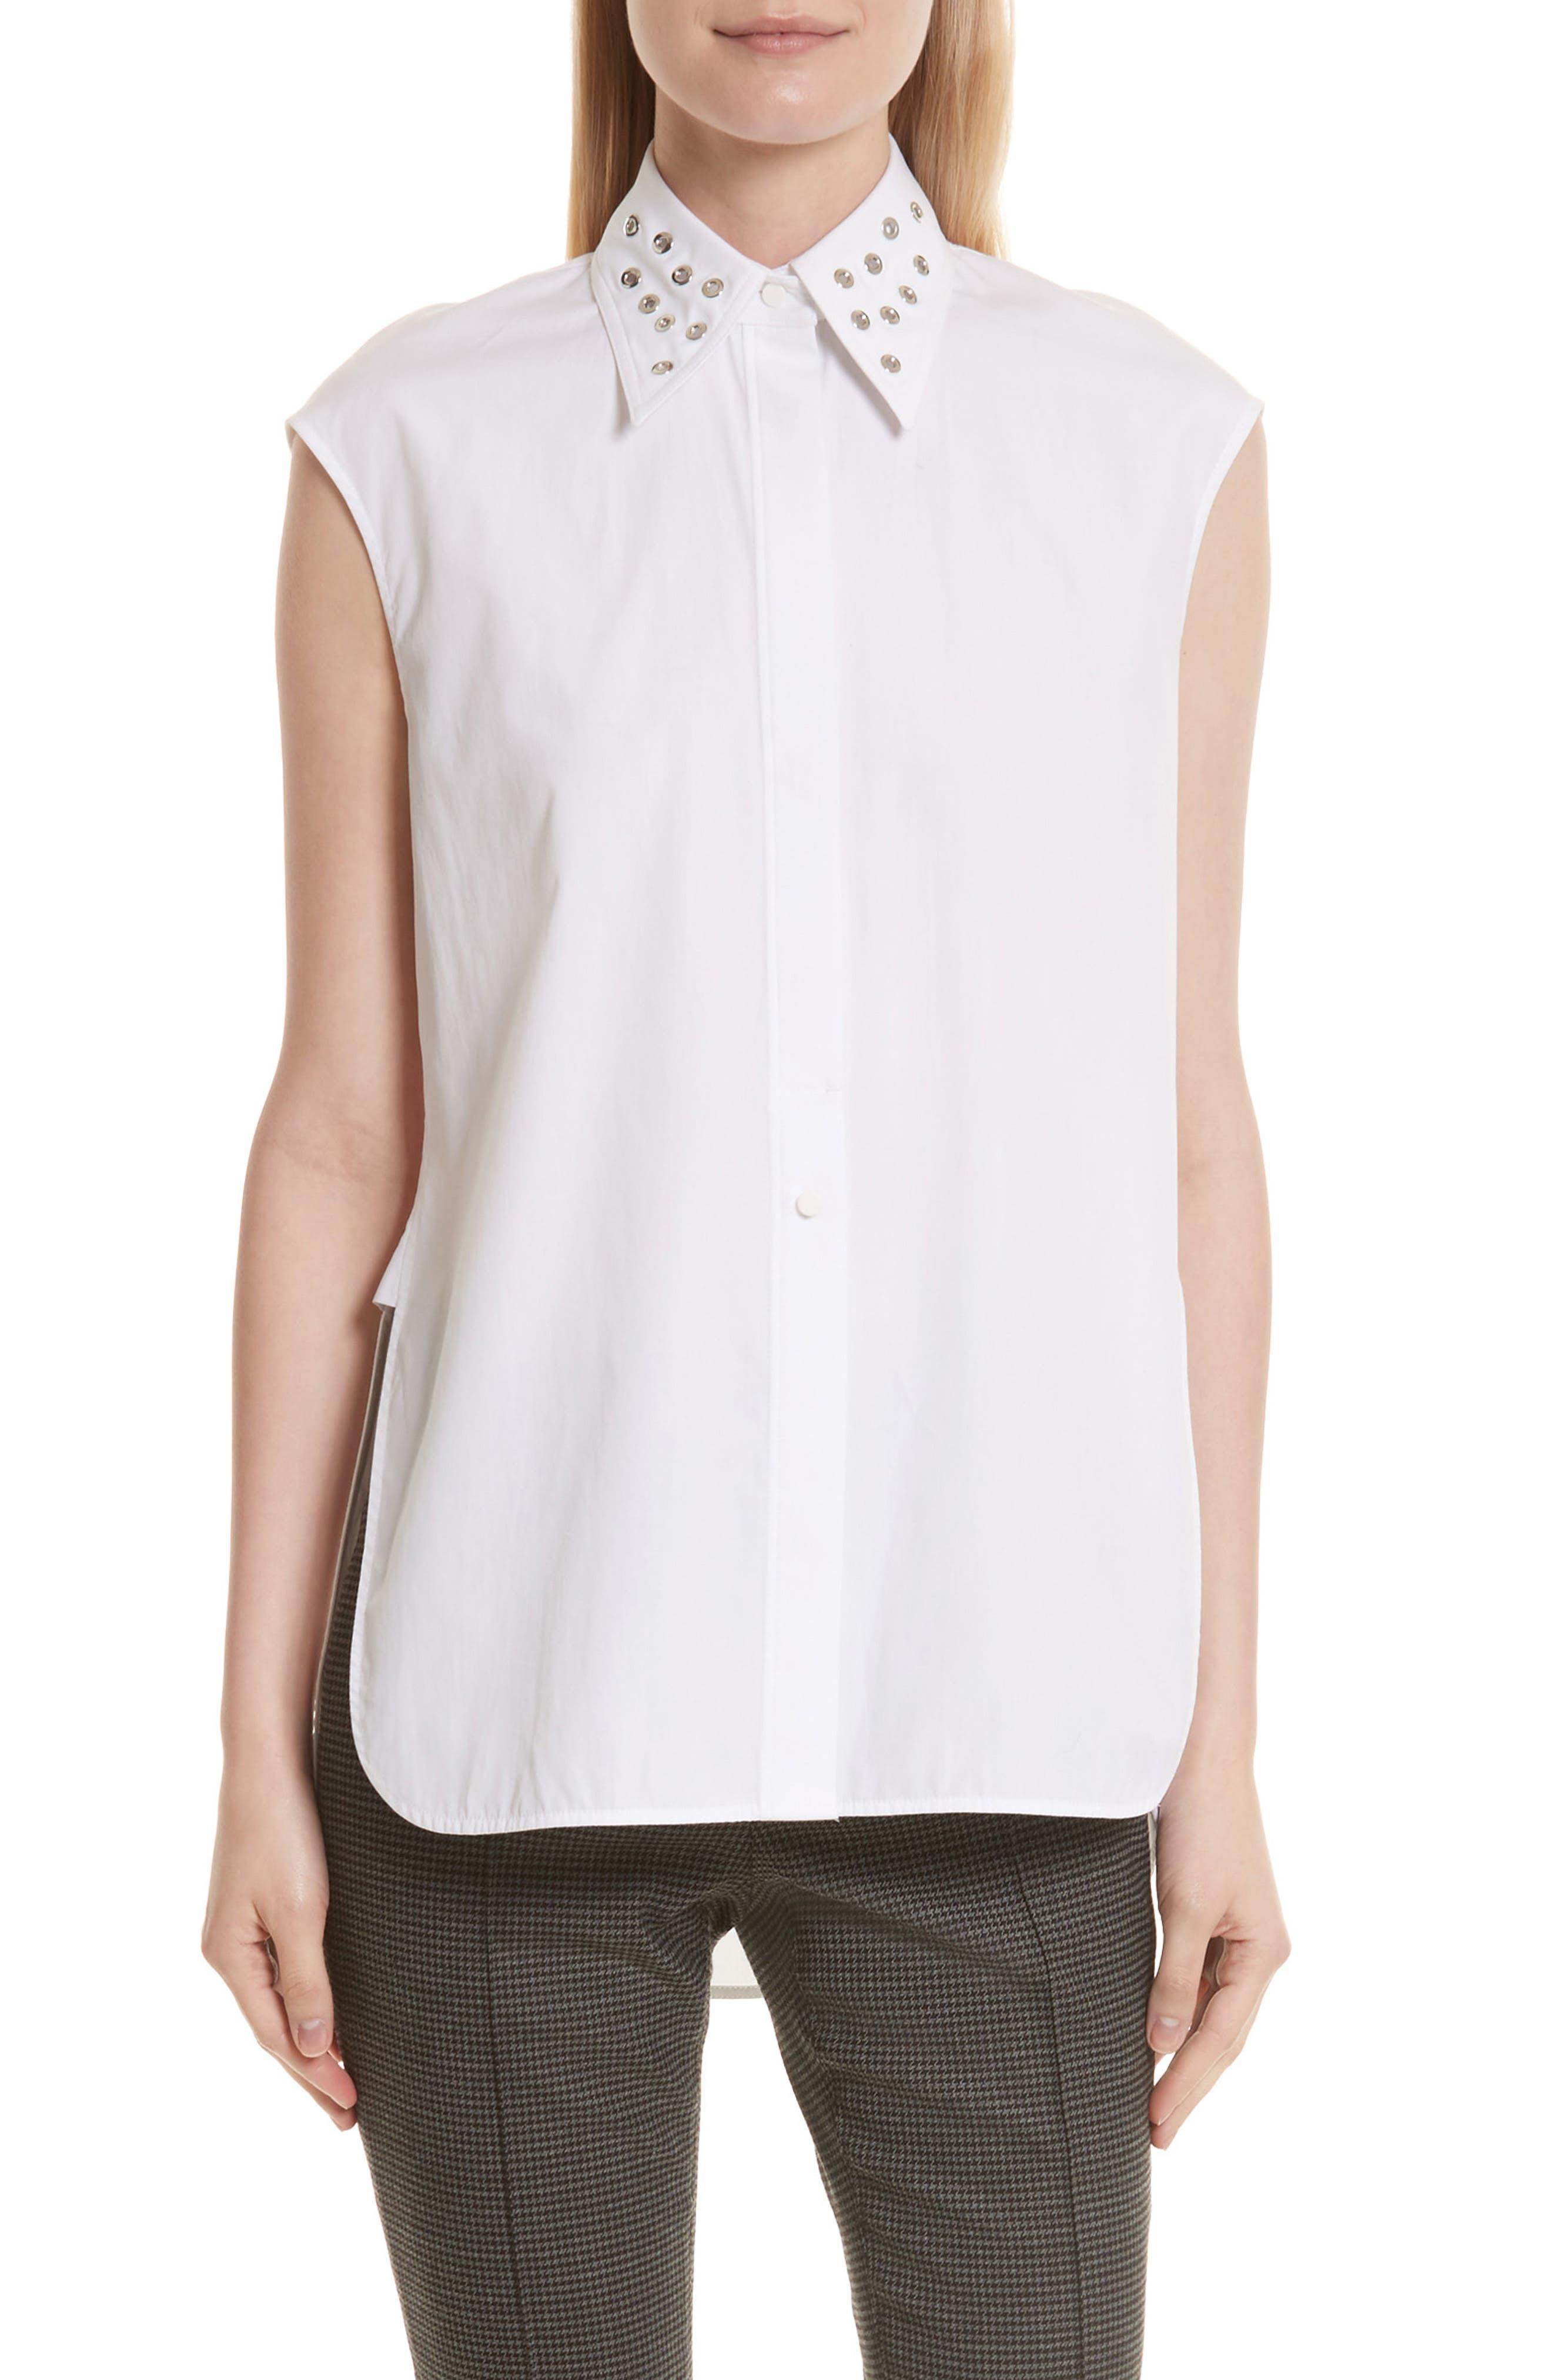 Main Image - Helmut Lang Eyelet Cotton Poplin Shirt